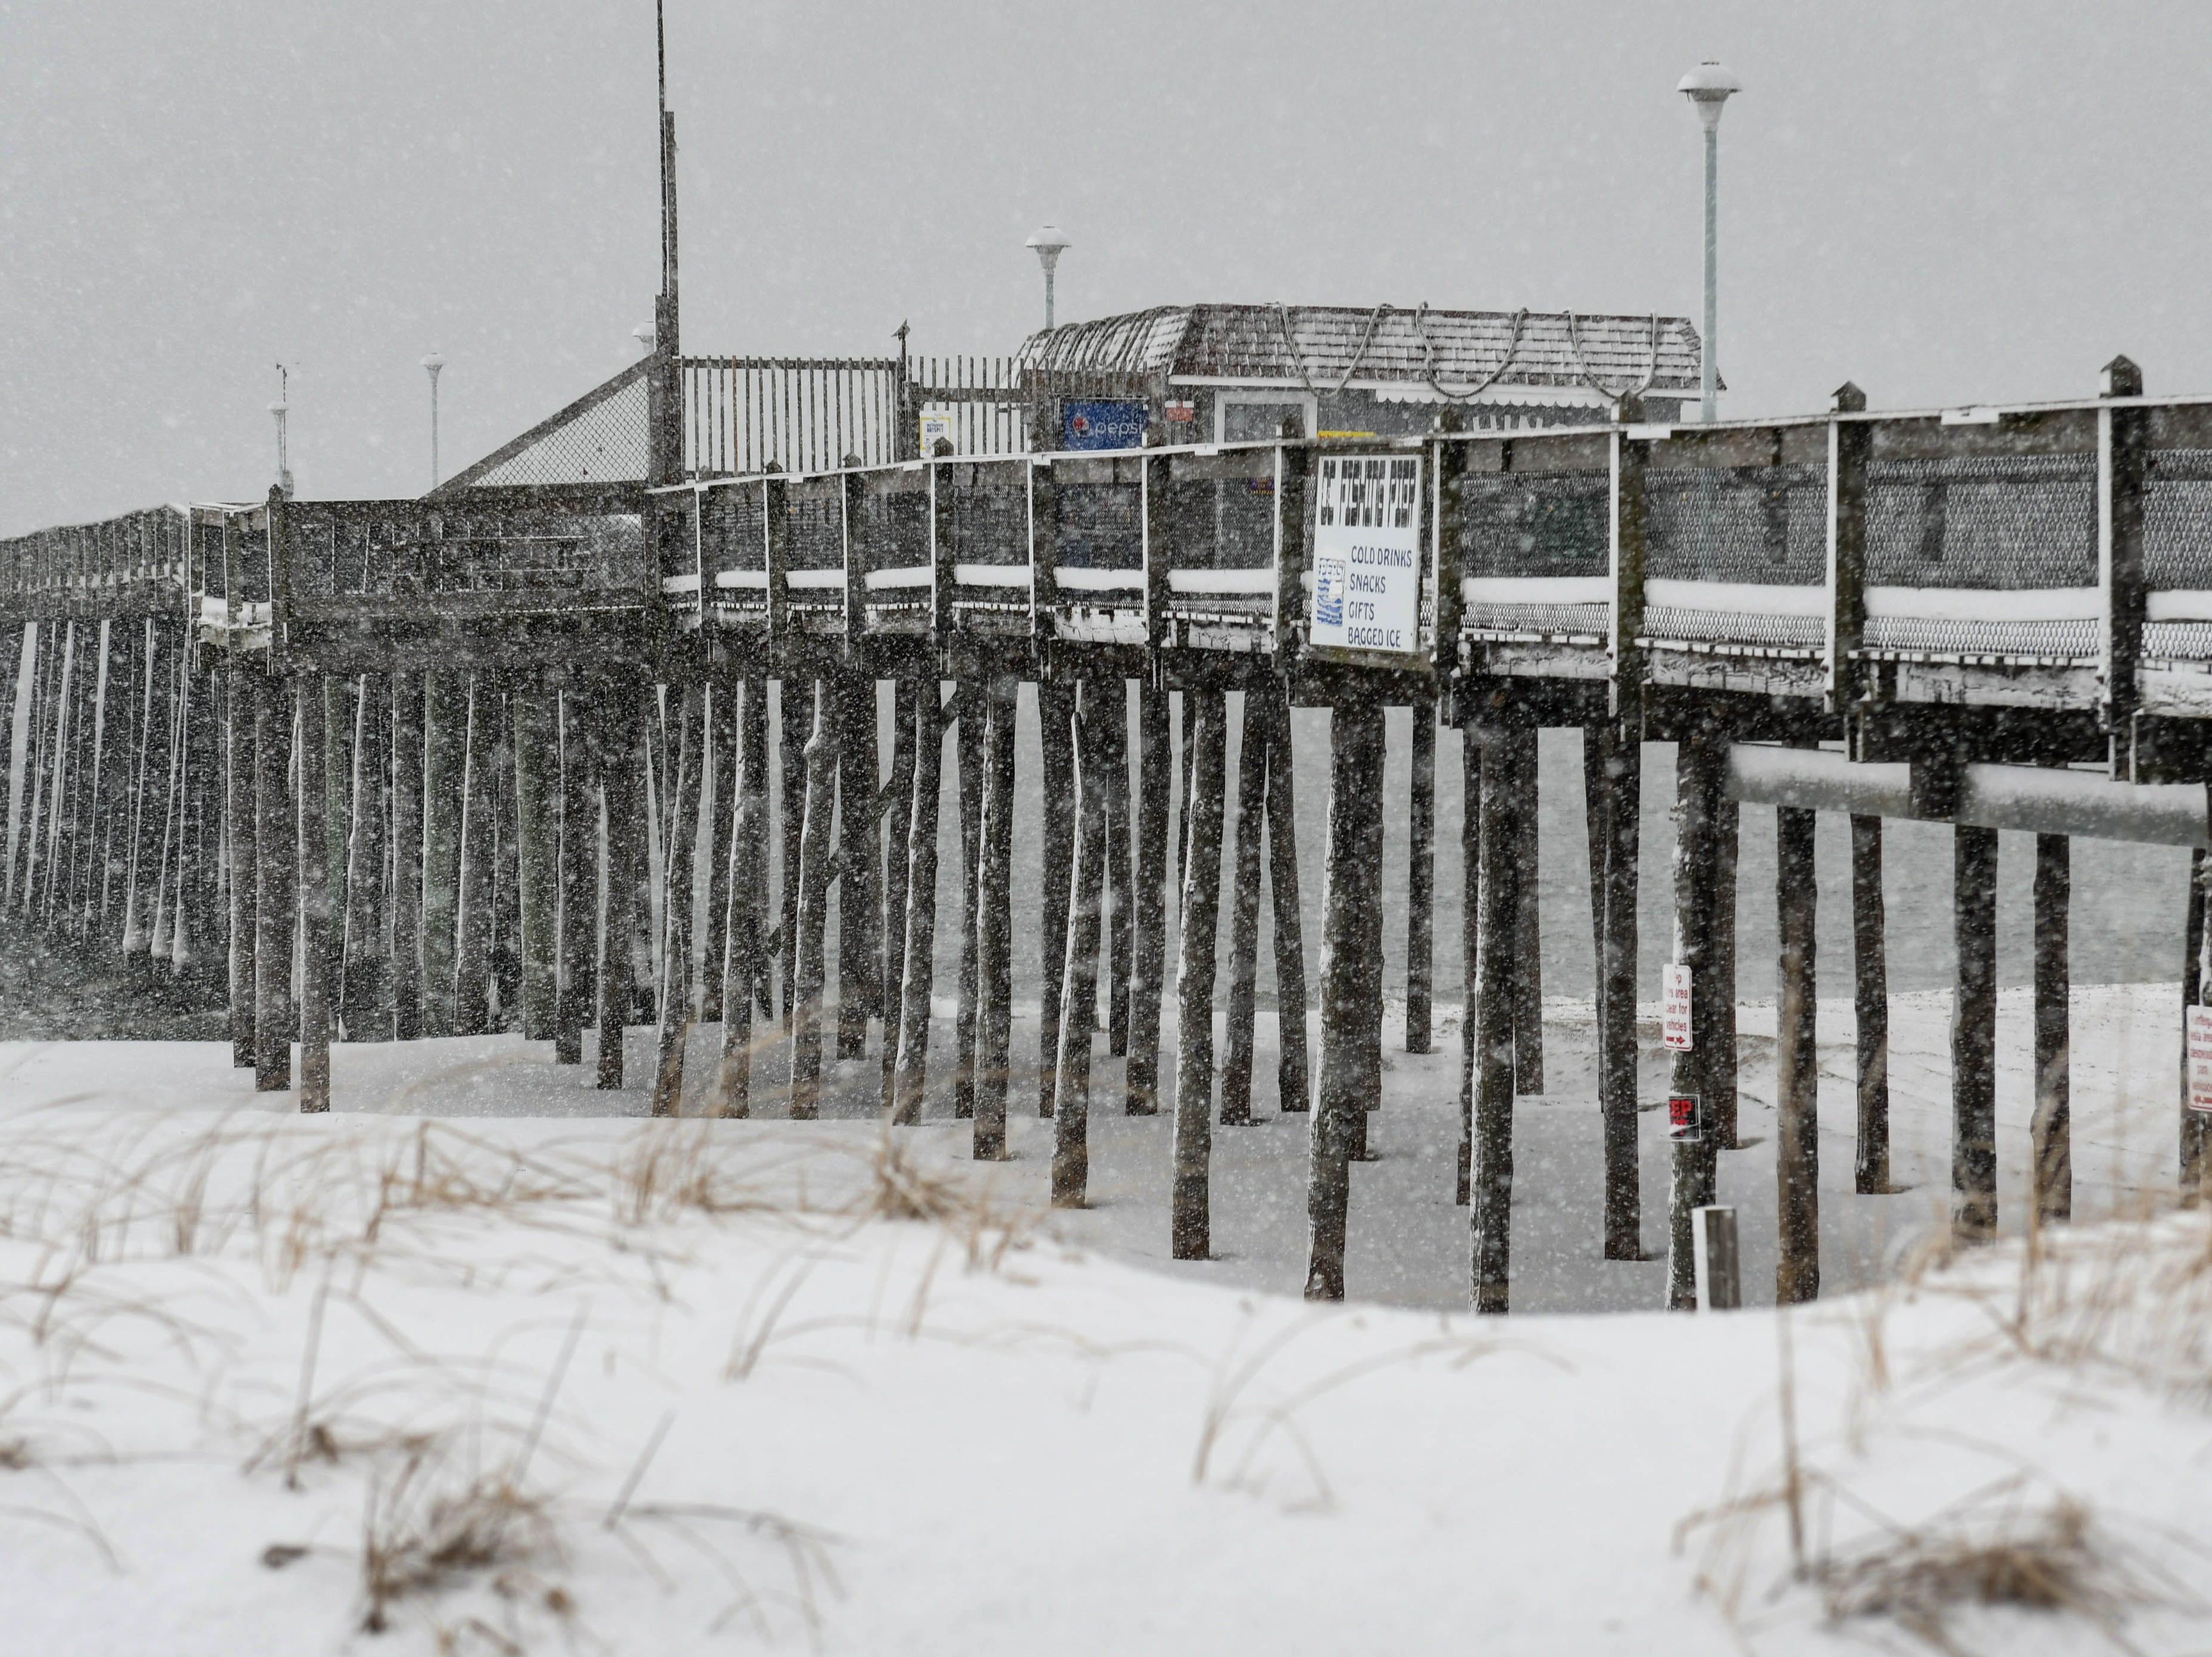 Snow coats the Ocean City beach during a storm on Friday, Feb. 1, 2019.